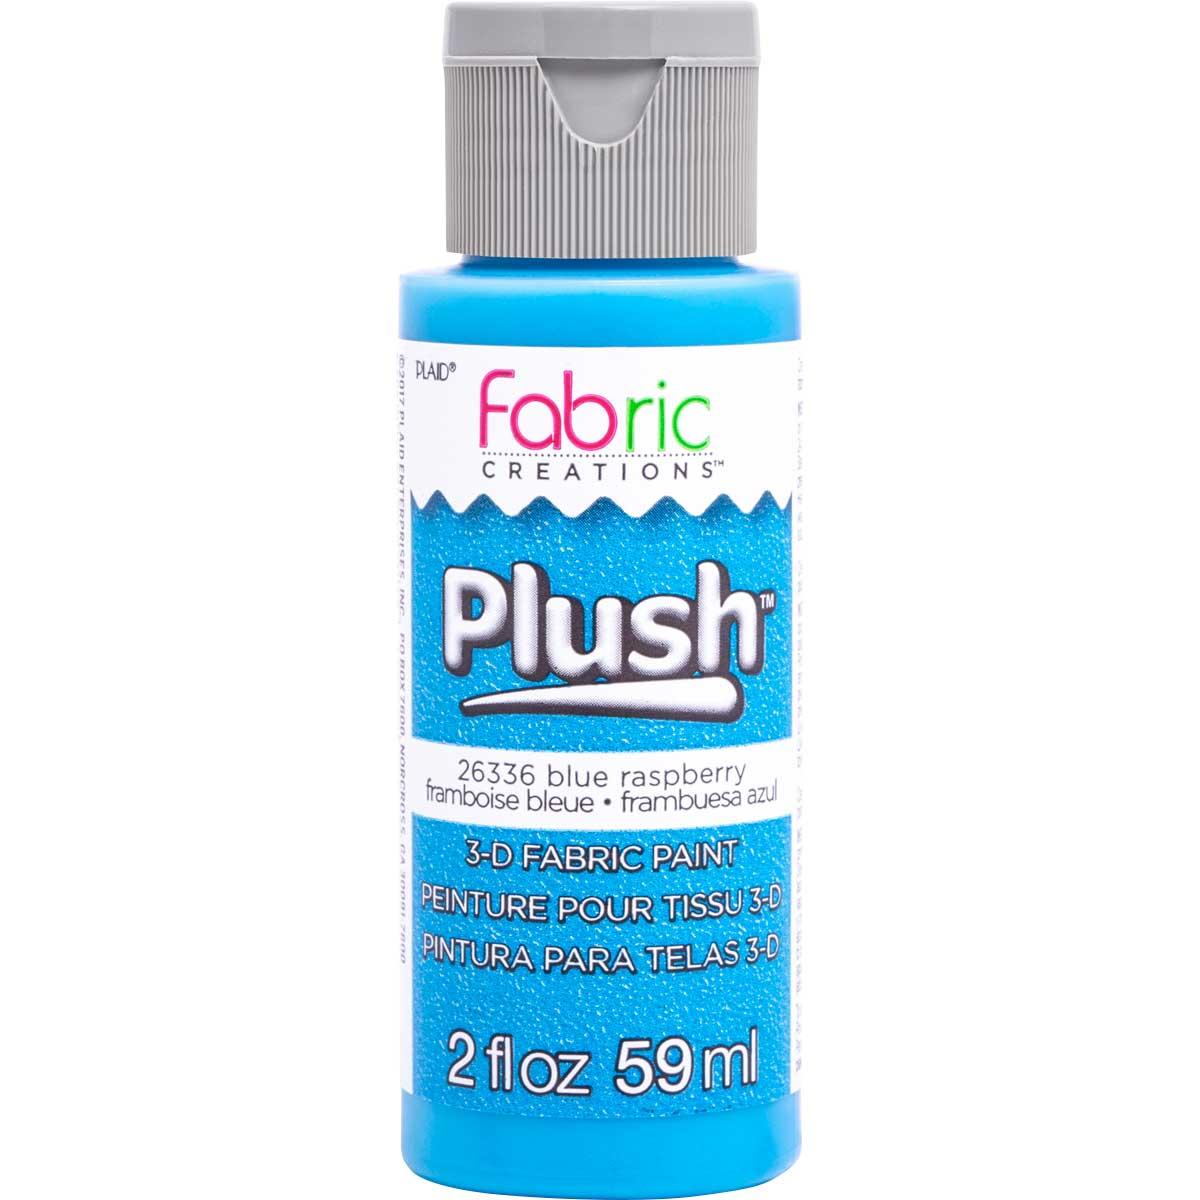 Fabric Creations™ Plush™ 3-D Fabric Paints - Blue Raspberry, 2 oz.